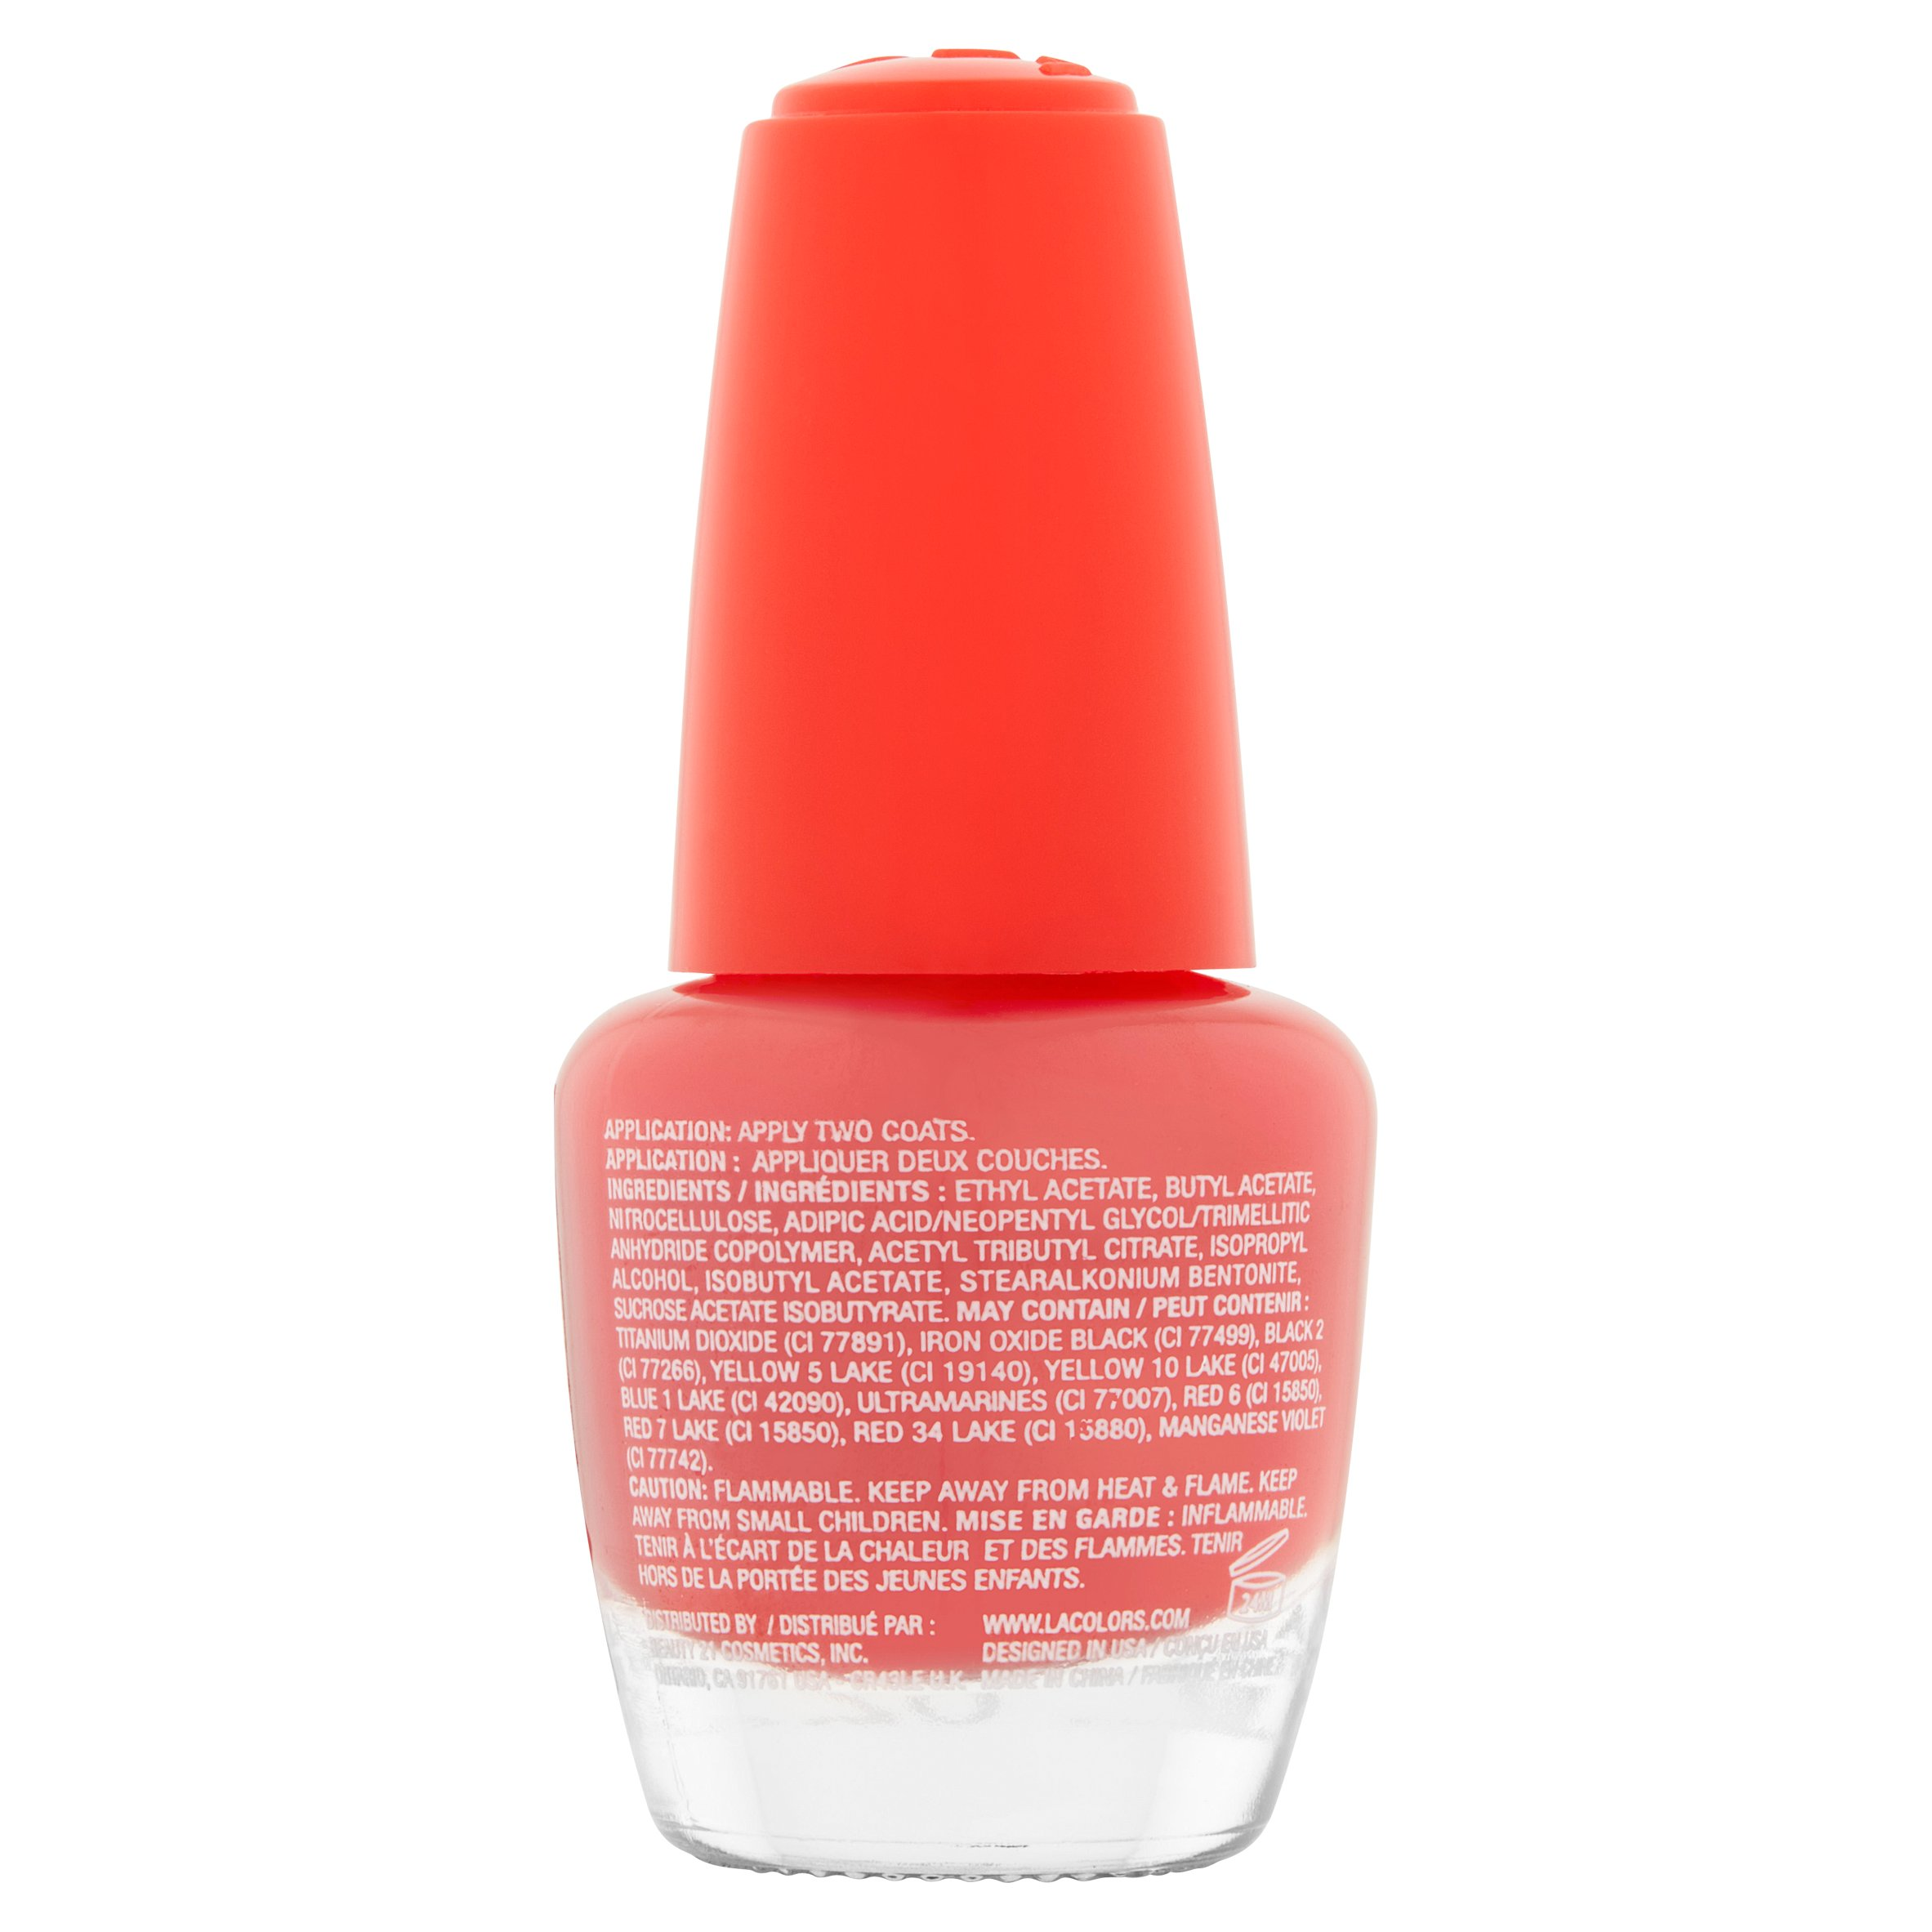 LA Colors Gel Shine Nail Polish, Fierce, 0.44 Oz - Walmart.com